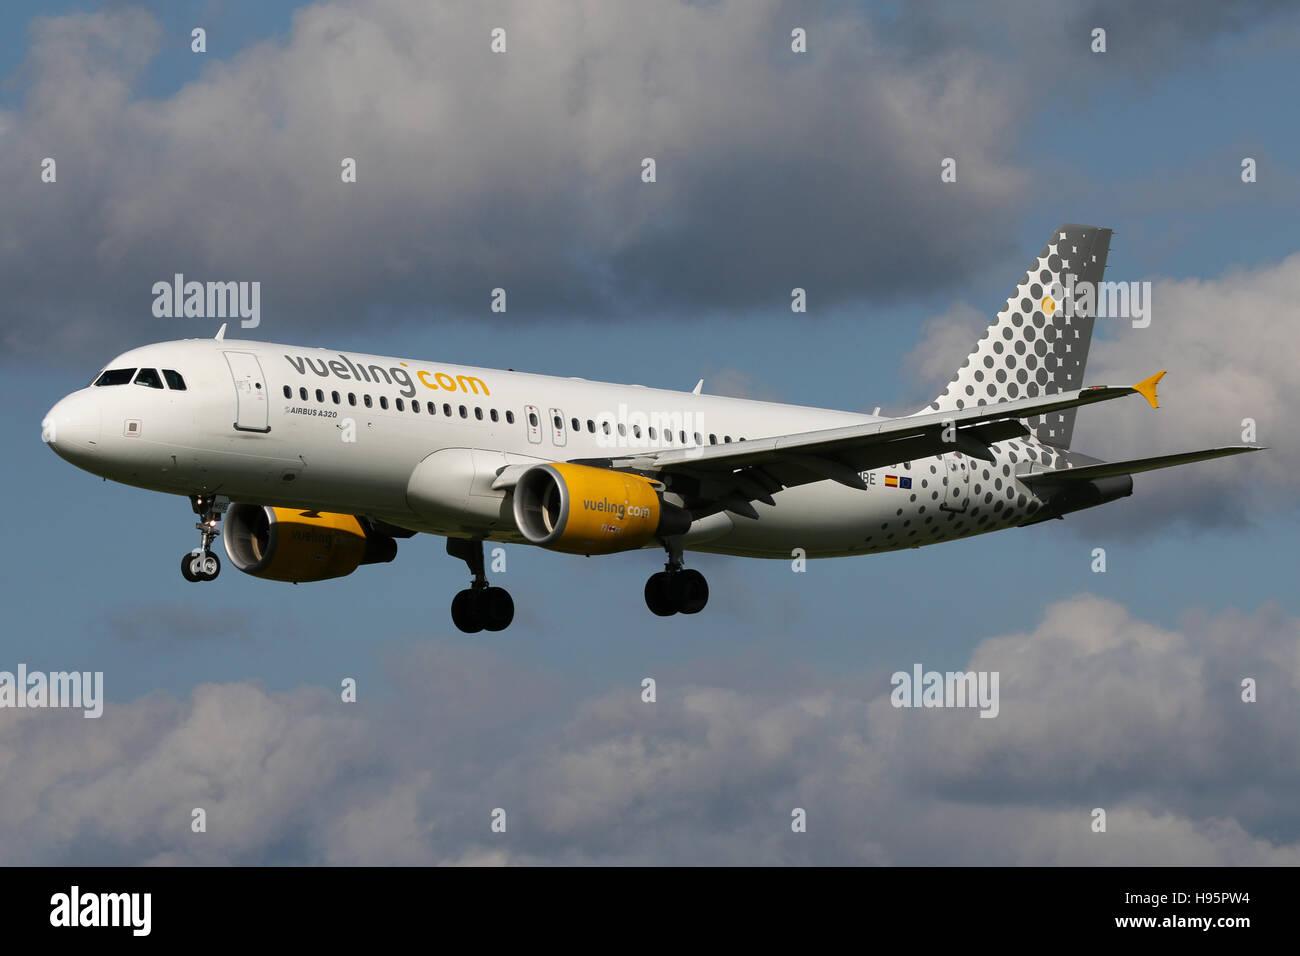 Zurich, Switzerland - July 29, 2016: Vueling, Airbus A320 is landing at Zurich Airport - Stock Image